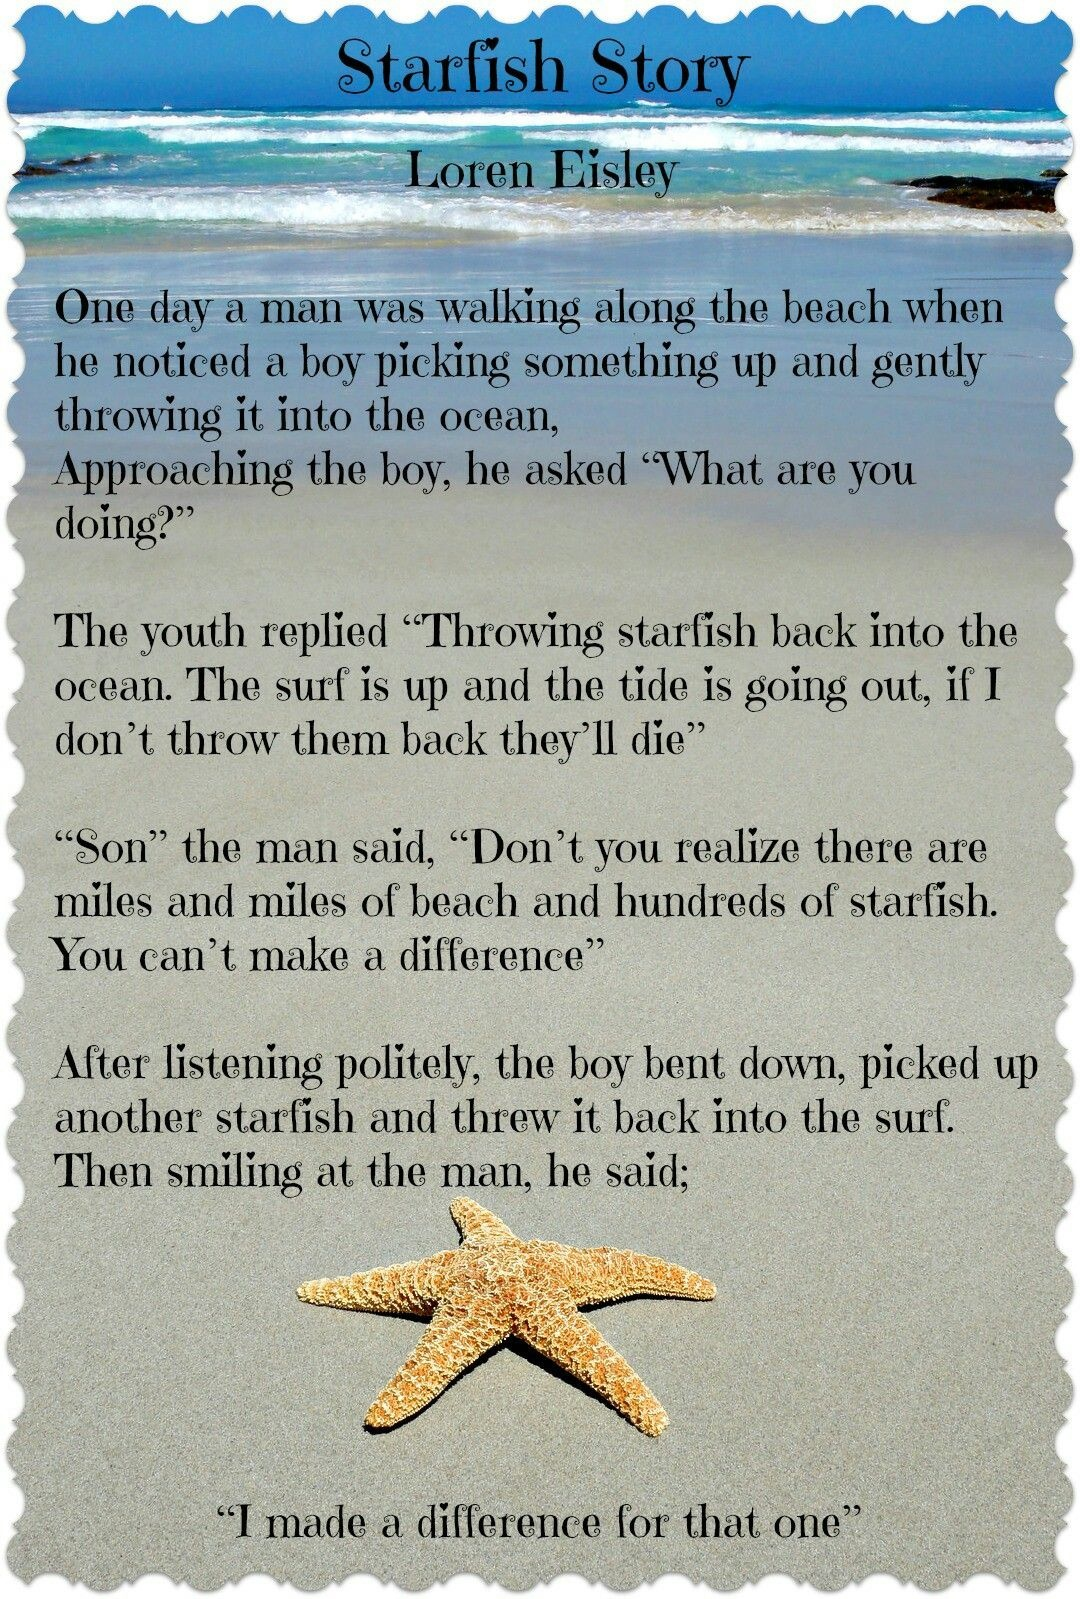 Pinclaire Neary-Wishart On Fav Quotes   Starfish Story, Free - Starfish Story Printable Free